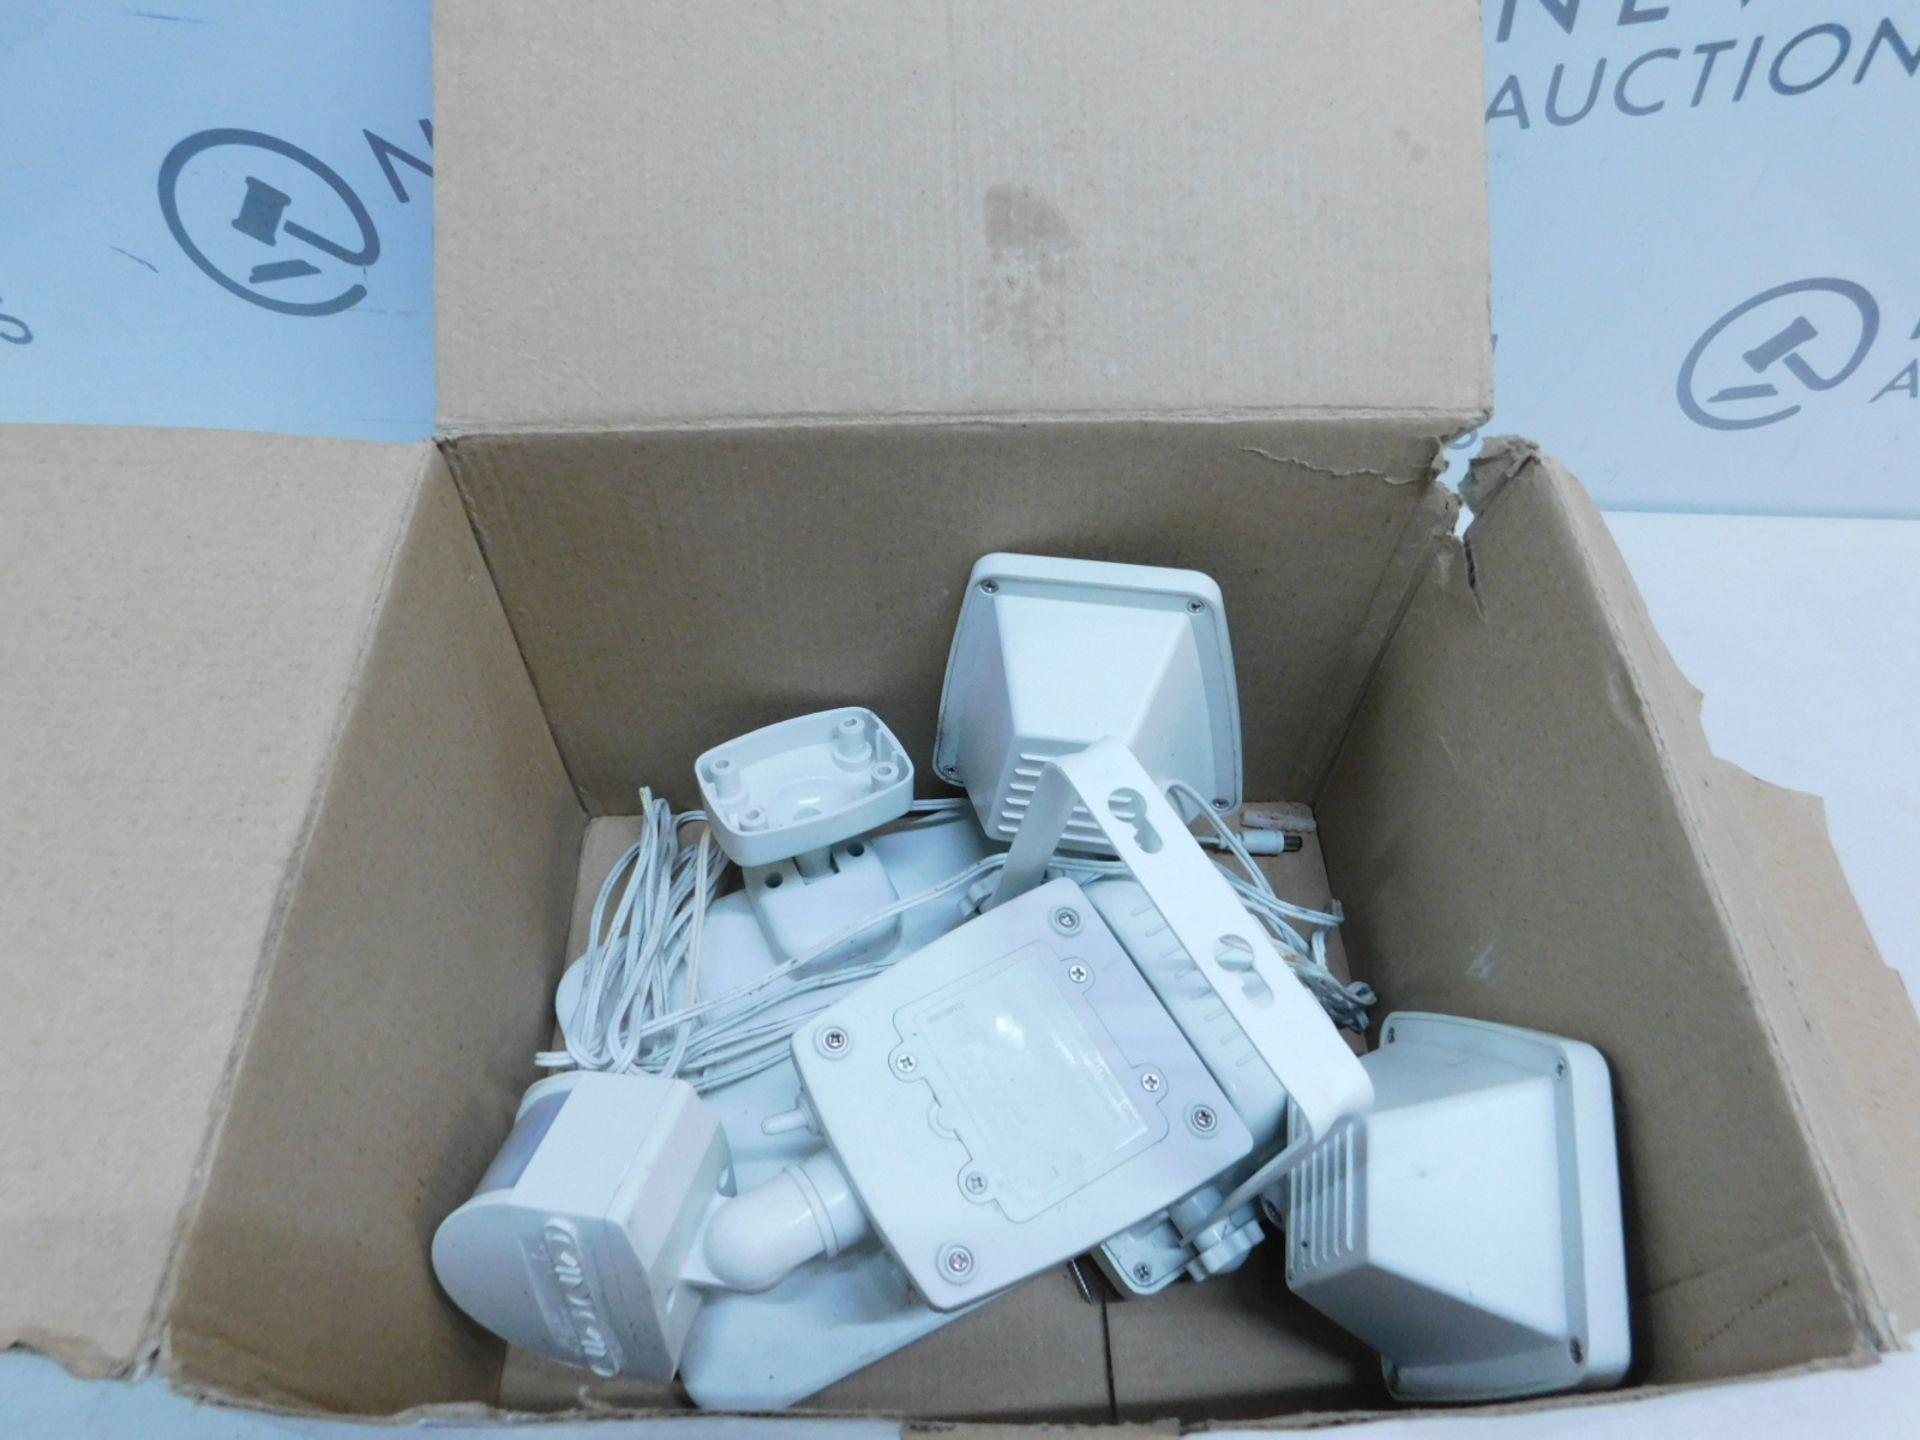 Lot 39 - 1 BOXED SUNFORCE 150 LED TRIPLE HEAD SOLAR MOTION ACTIVATED LIGHT RRP £119.99